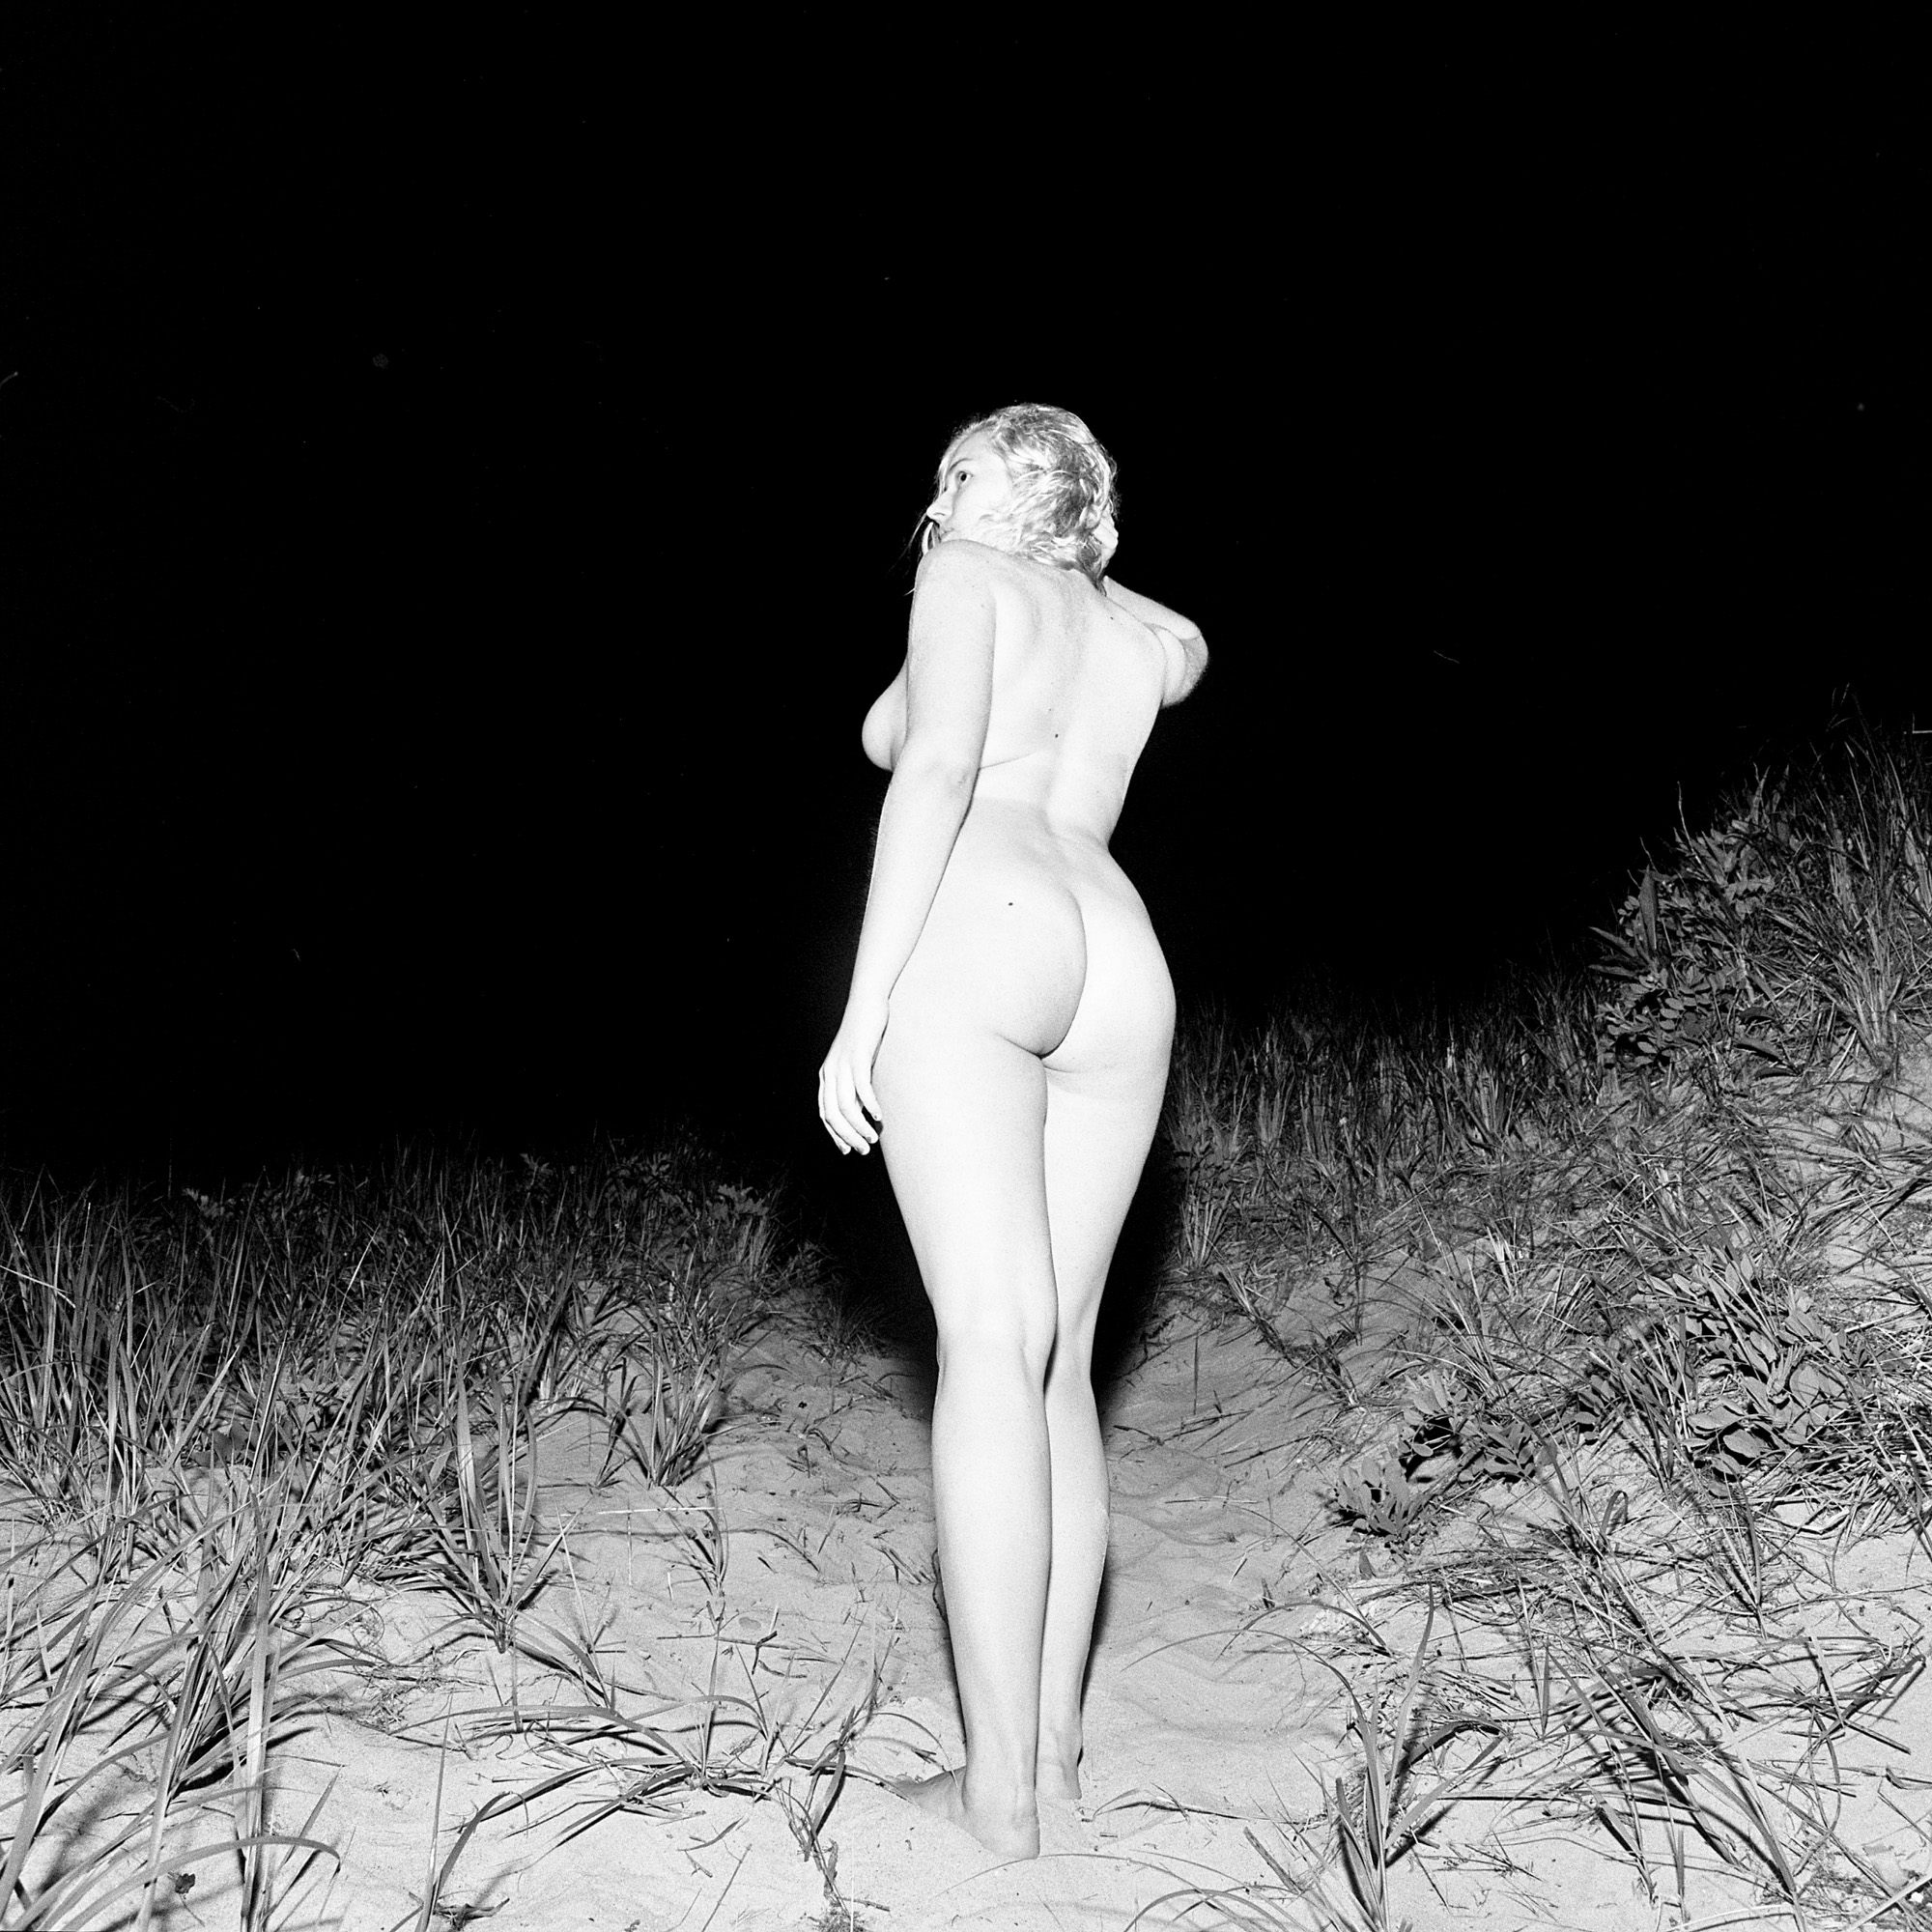 Henrikson Archive Nudes web_50.jpg